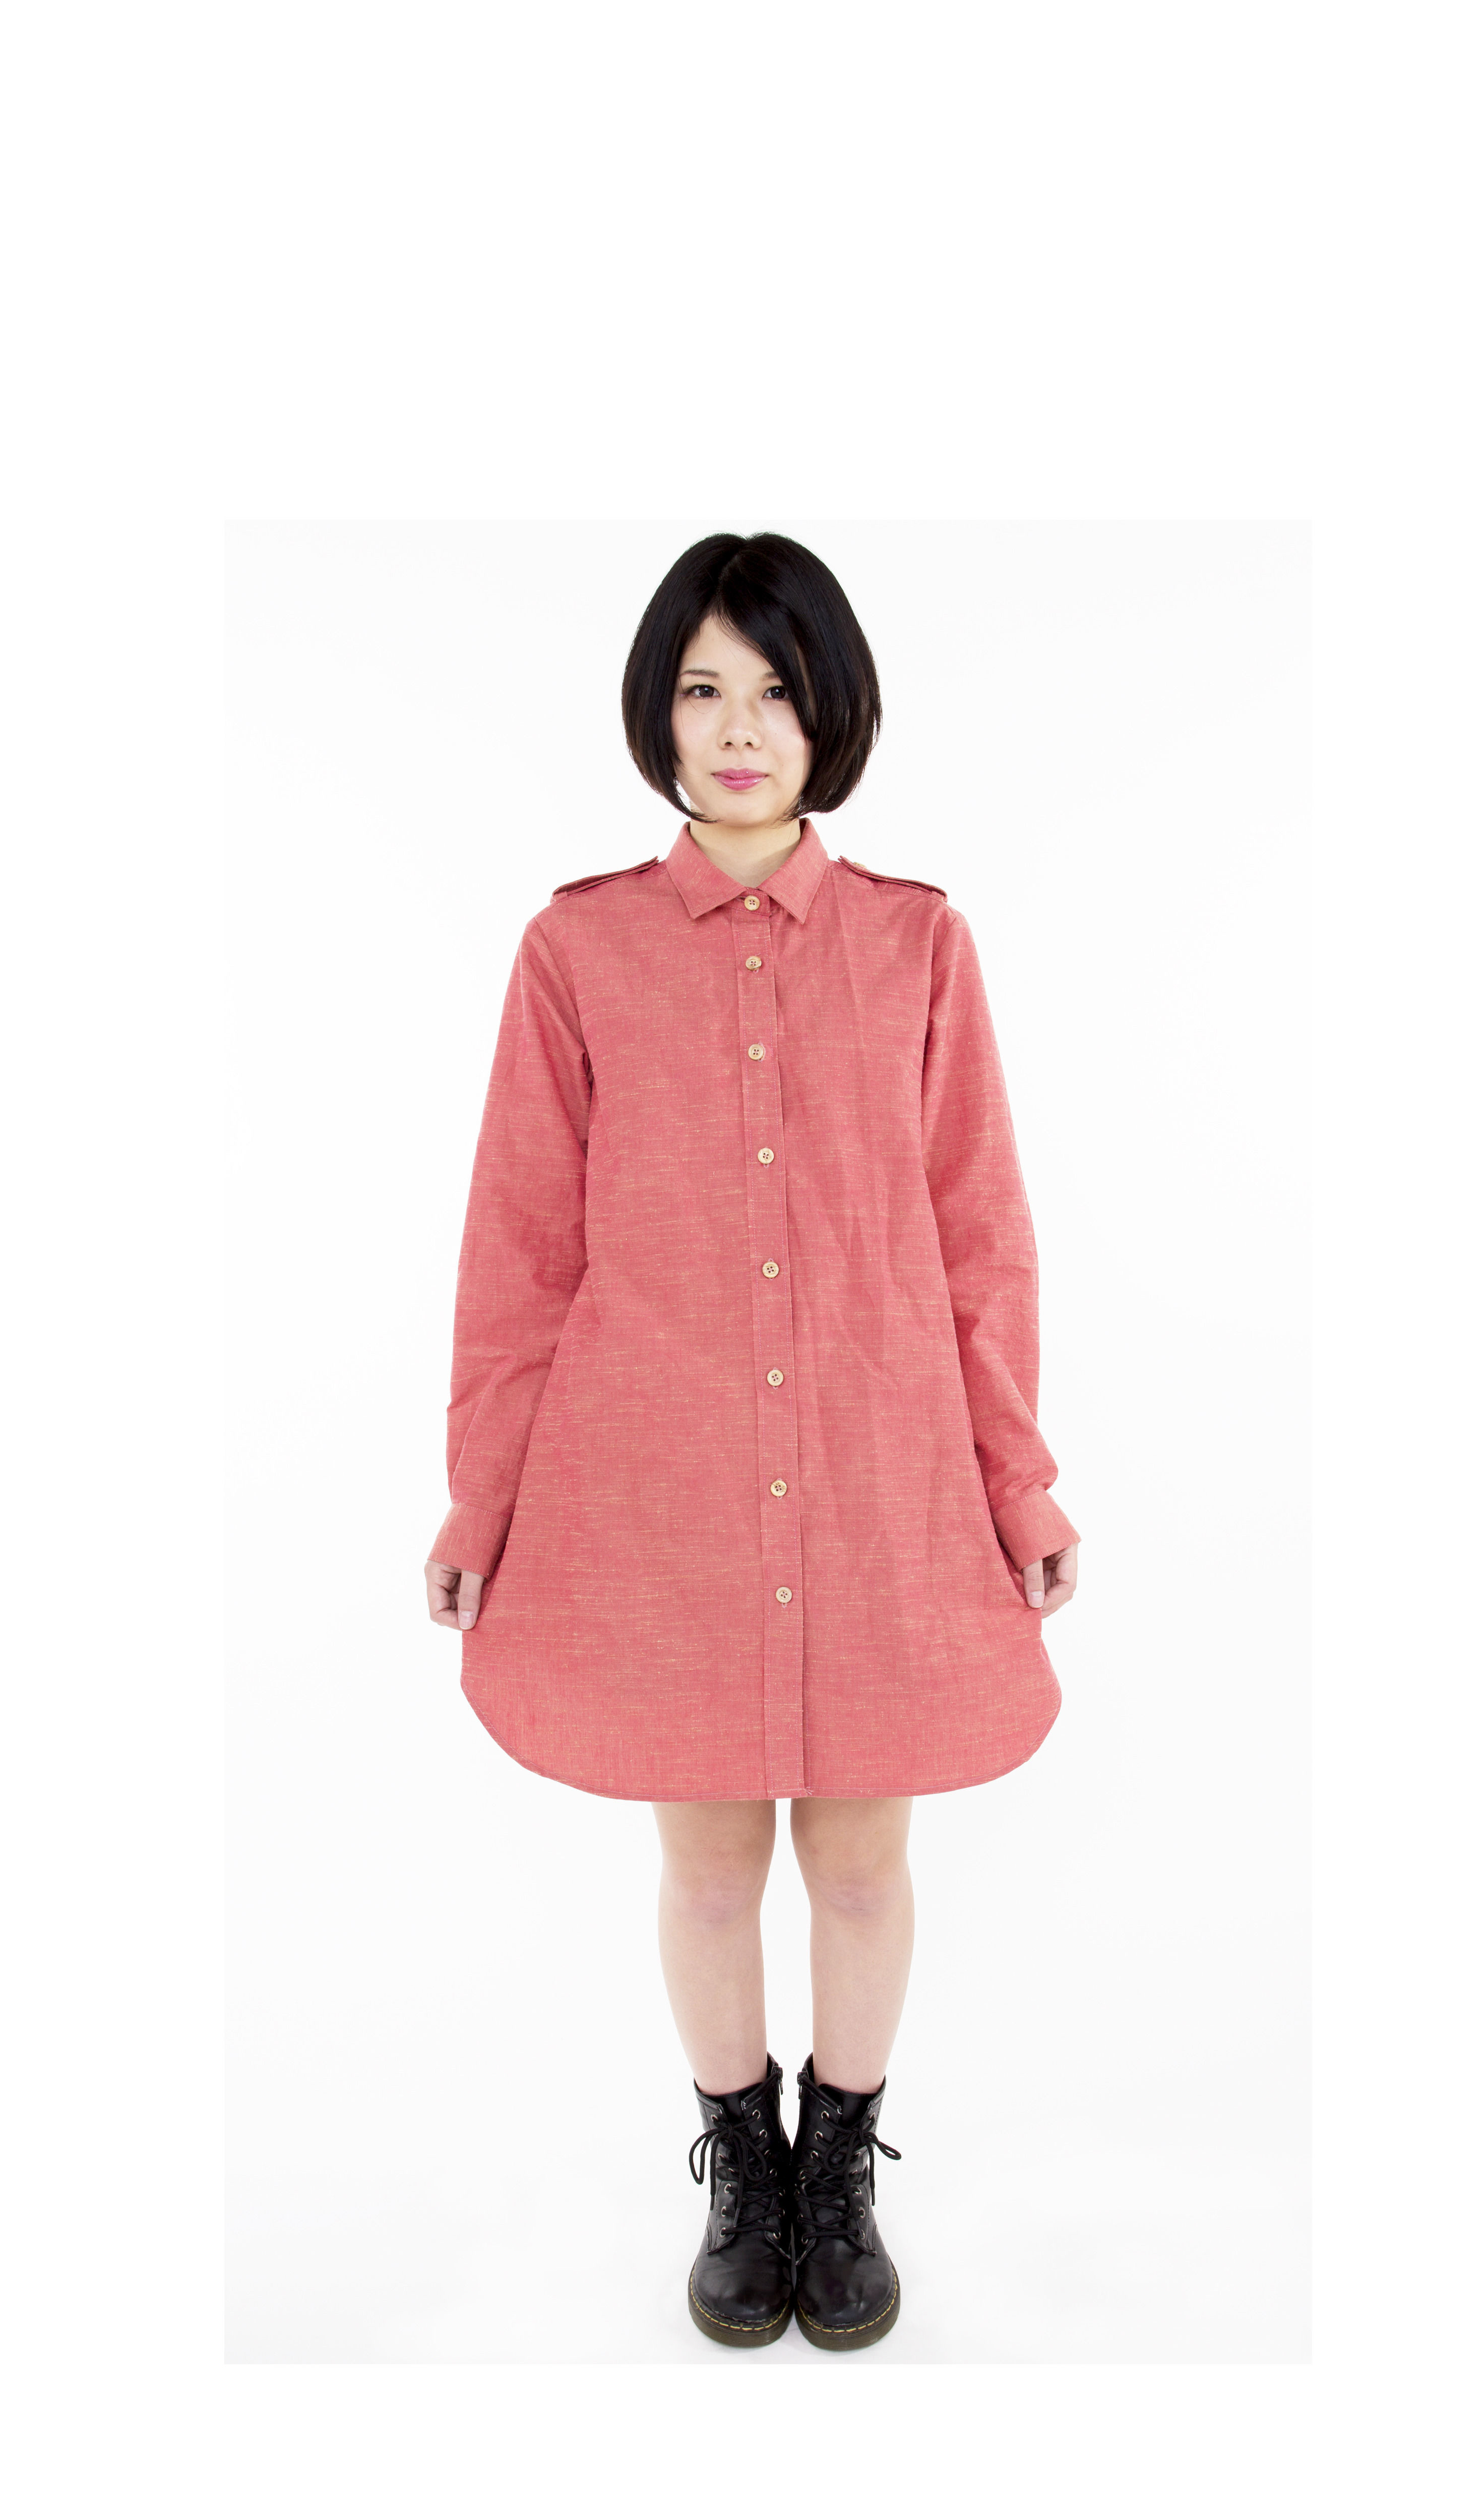 【SALE 50%OFF】taRo ロングシャツ lady's